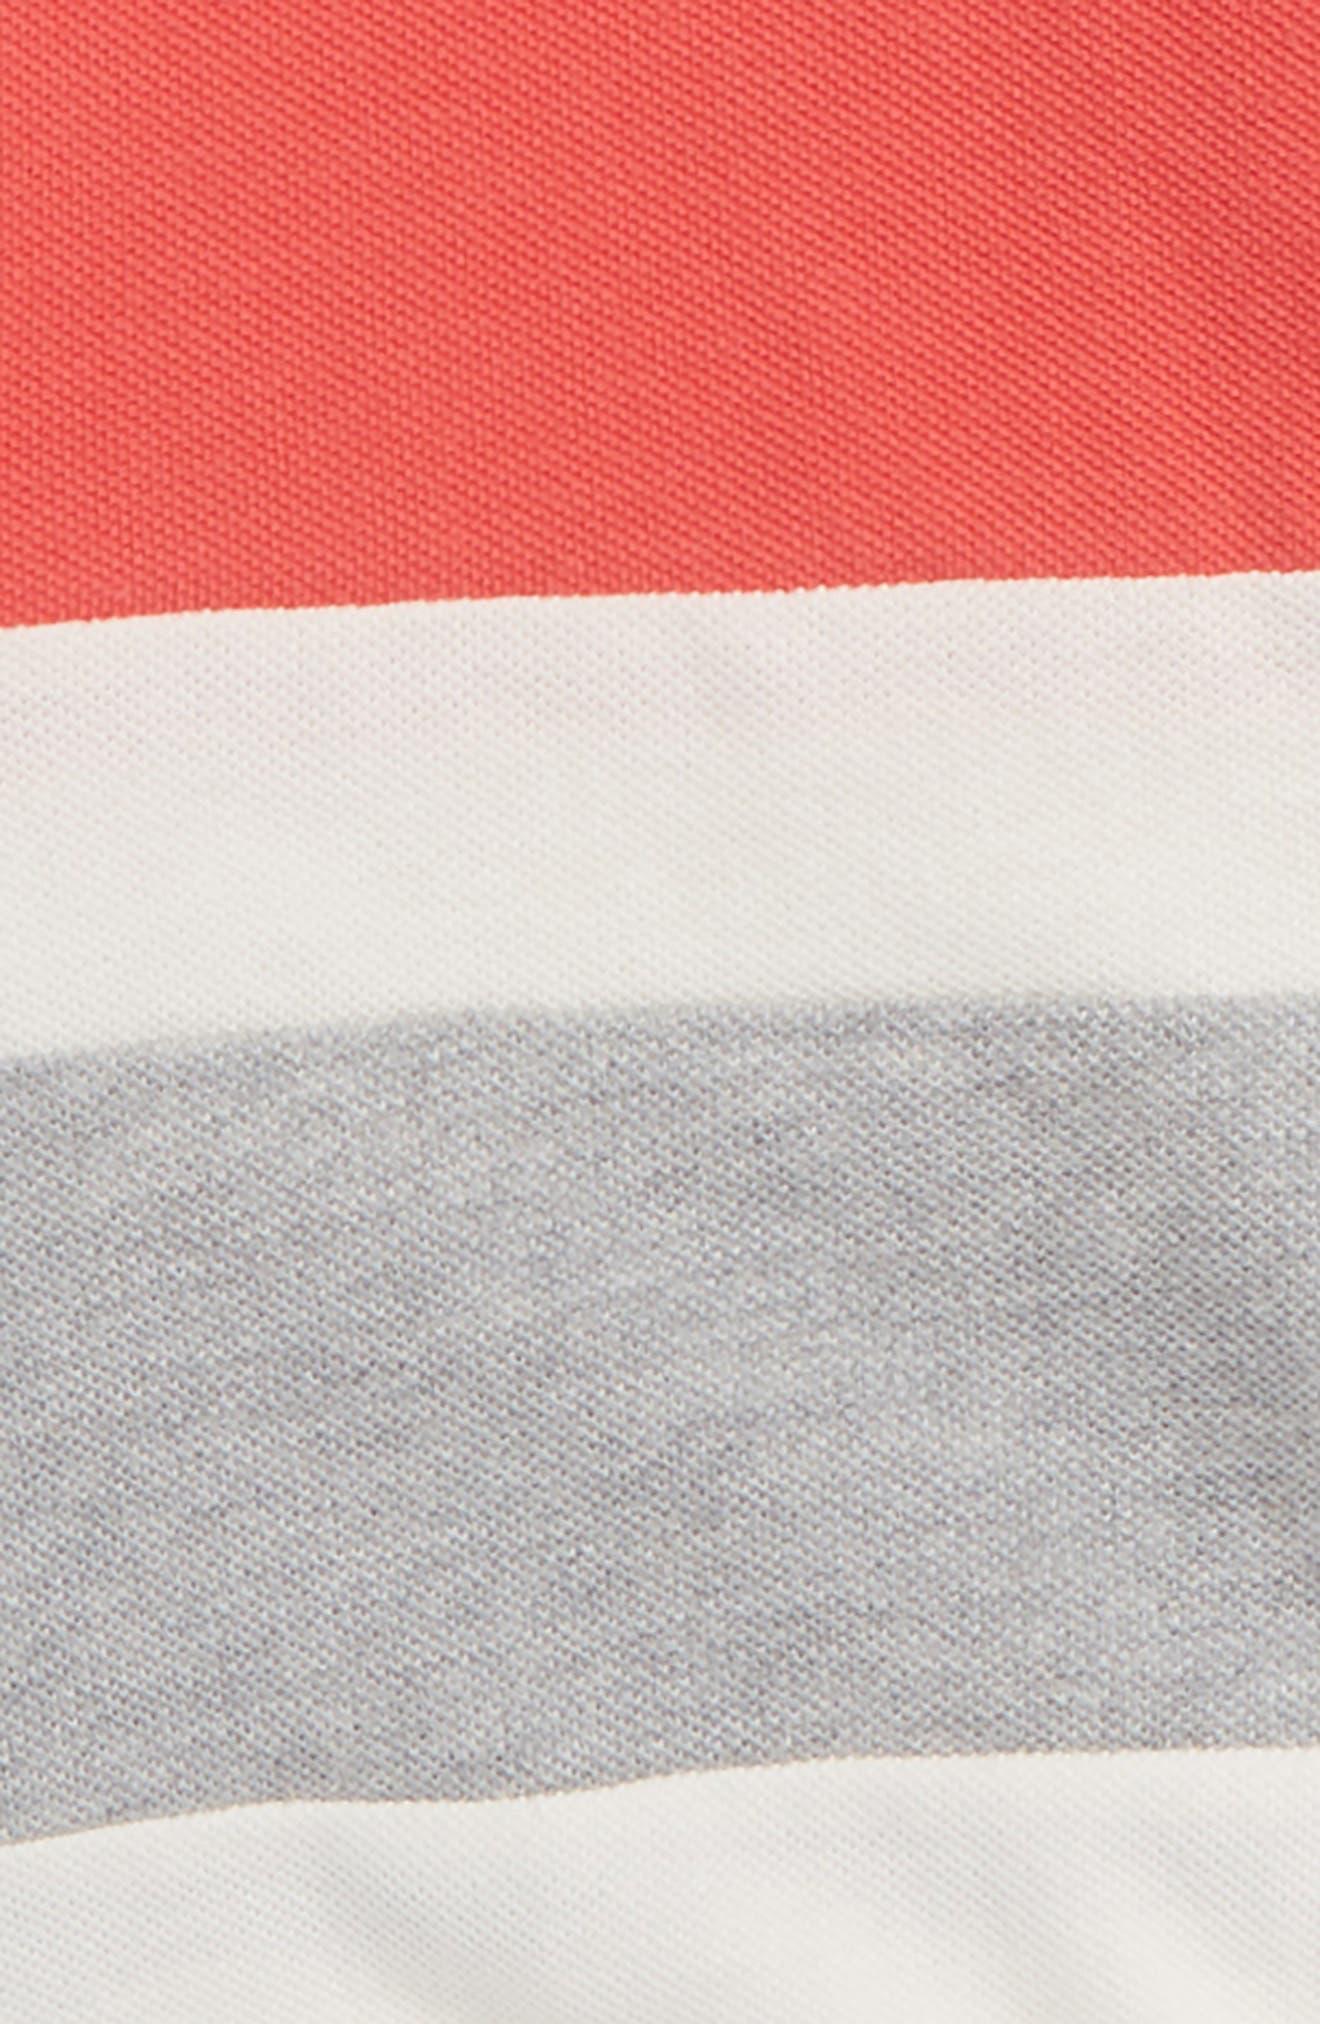 Colorblock Piqué Polo,                             Alternate thumbnail 2, color,                             614